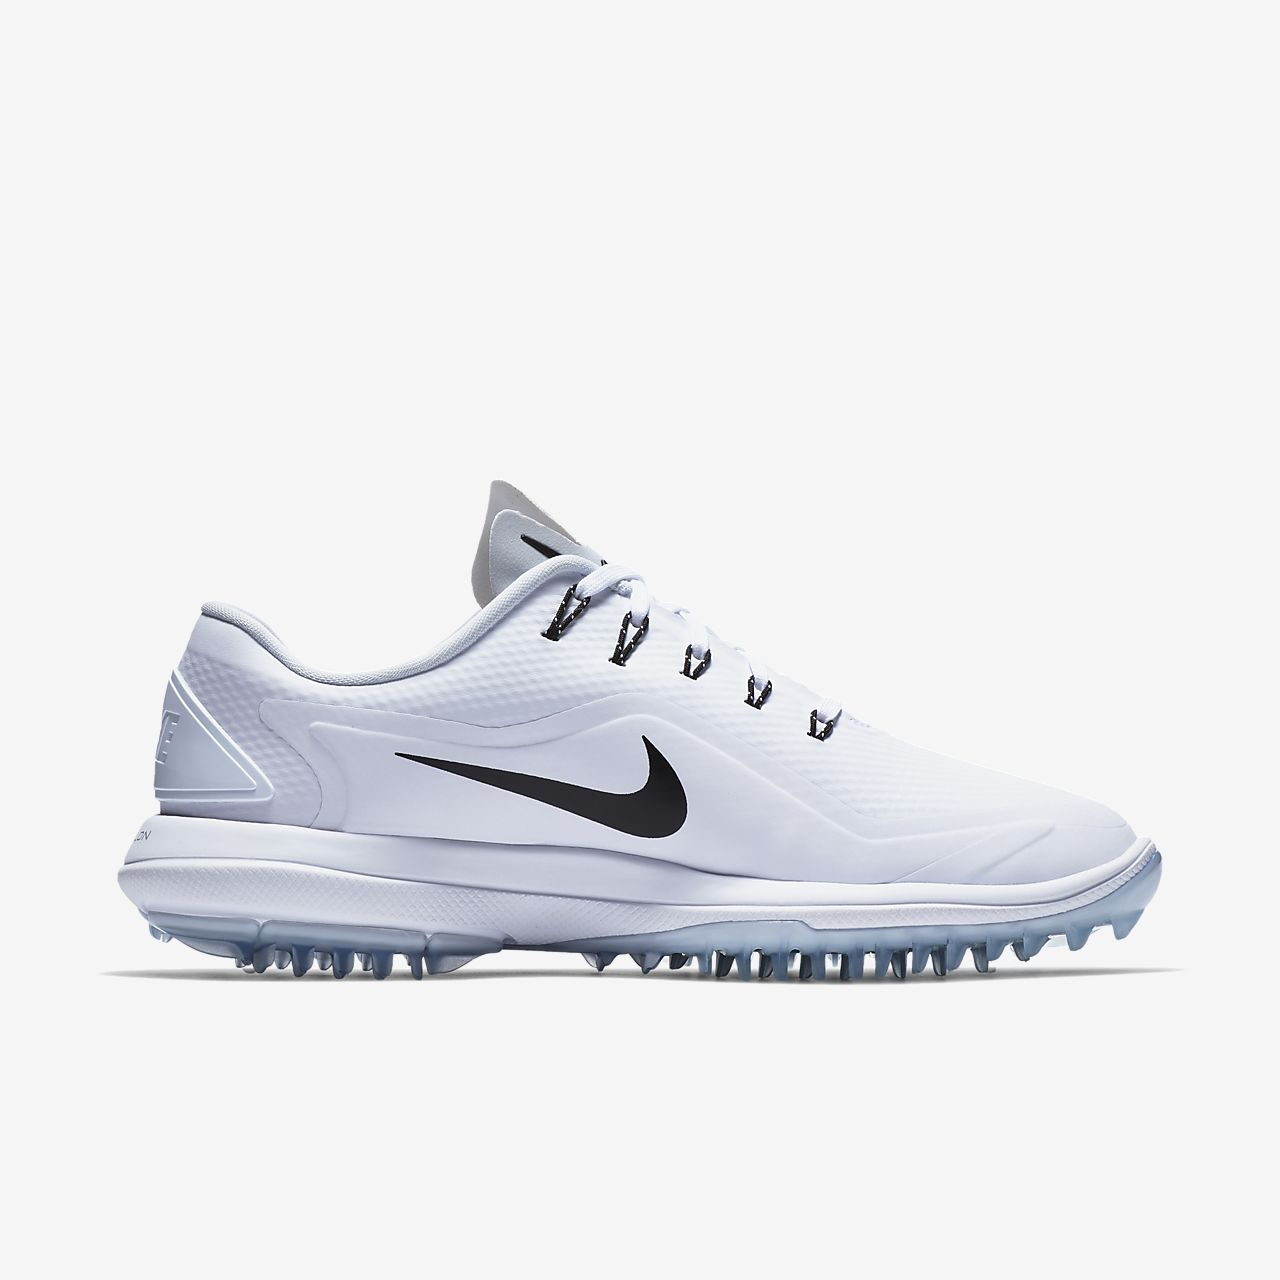 differently 5dde2 5d973 Scarpa da golf Nike Lunar Control Vapor 2 - Donna. Nike.com IT